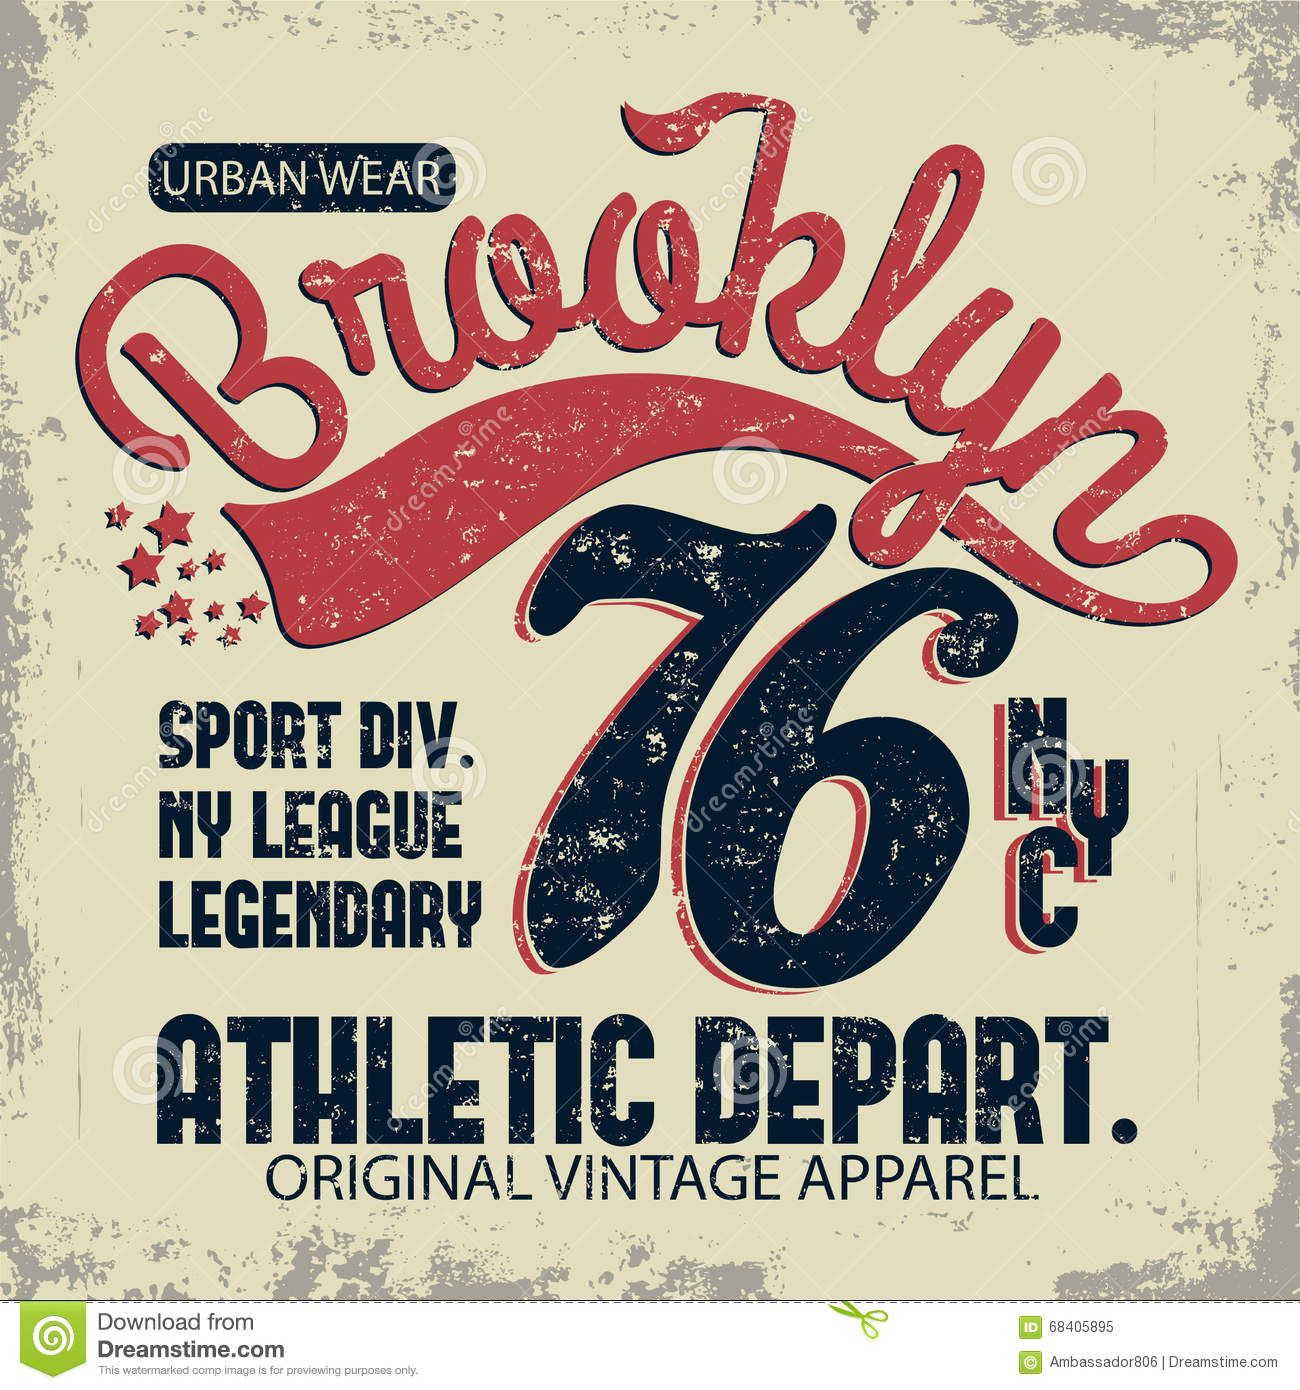 https://thumbs.dreamstime.com/z/denim-typography-t-shirt-graphics-new-york-vintage-wear-tee-print-design-68405895.jpg